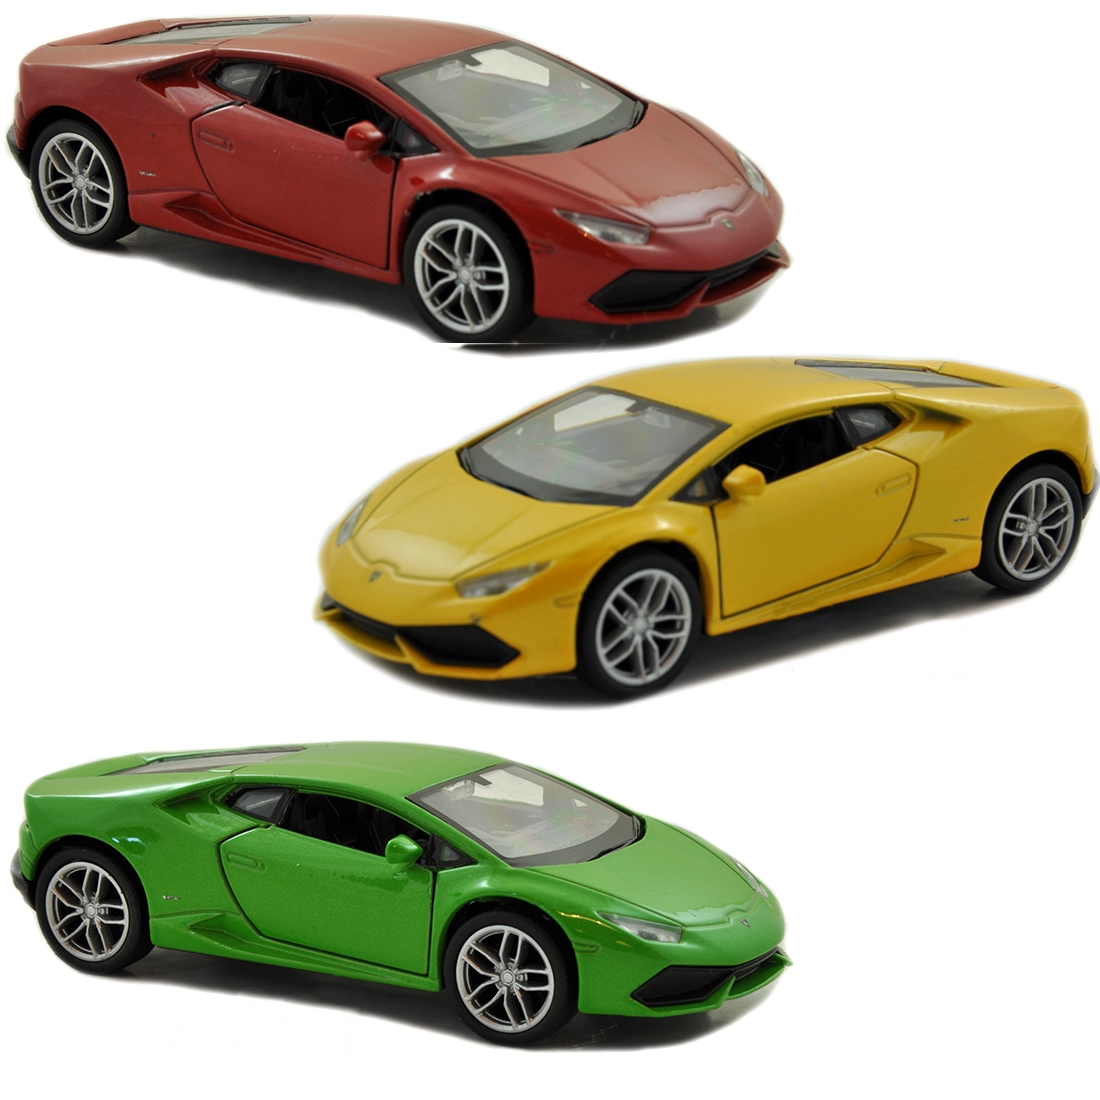 Модель машины Lamborghini Huracan, 1:34-39 LP 610-4Lamborghini<br>Модель машины Lamborghini Huracan, 1:34-39 LP 610-4<br>